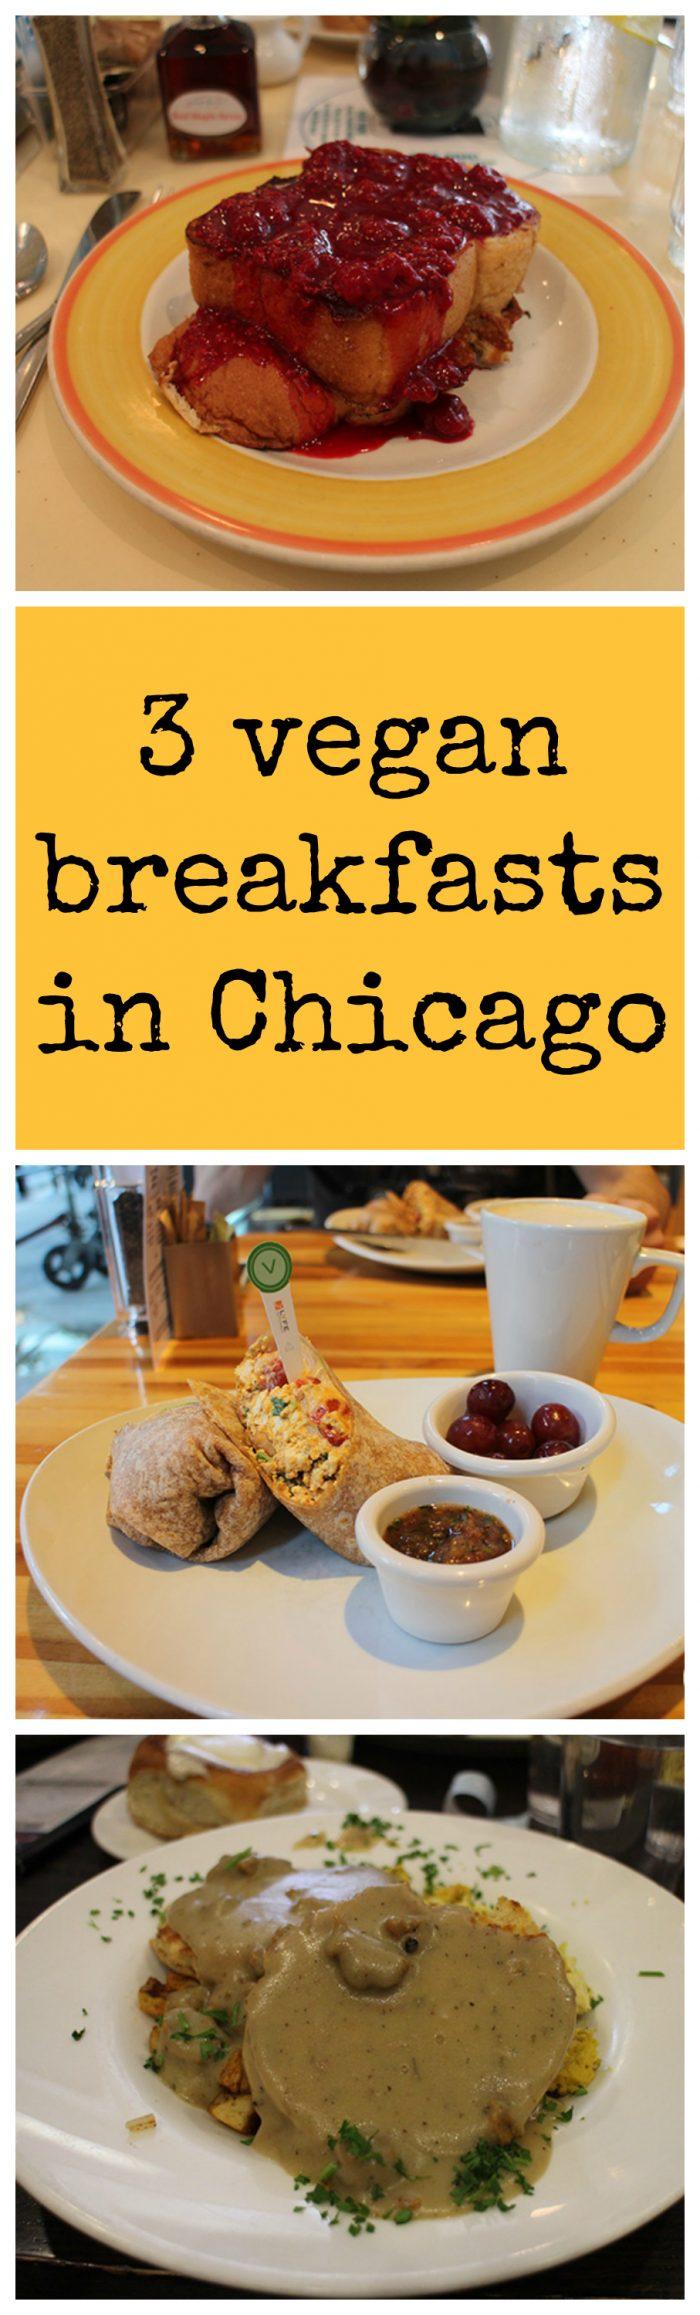 Vegan Travel: 3 vegan breakfasts in Chicago. While in Chicago recently, we visited Cloud Gate, Pritzker Pavilion, Willis Tower, and plenty of vegetarian restaurants. | cadryskitchen.com